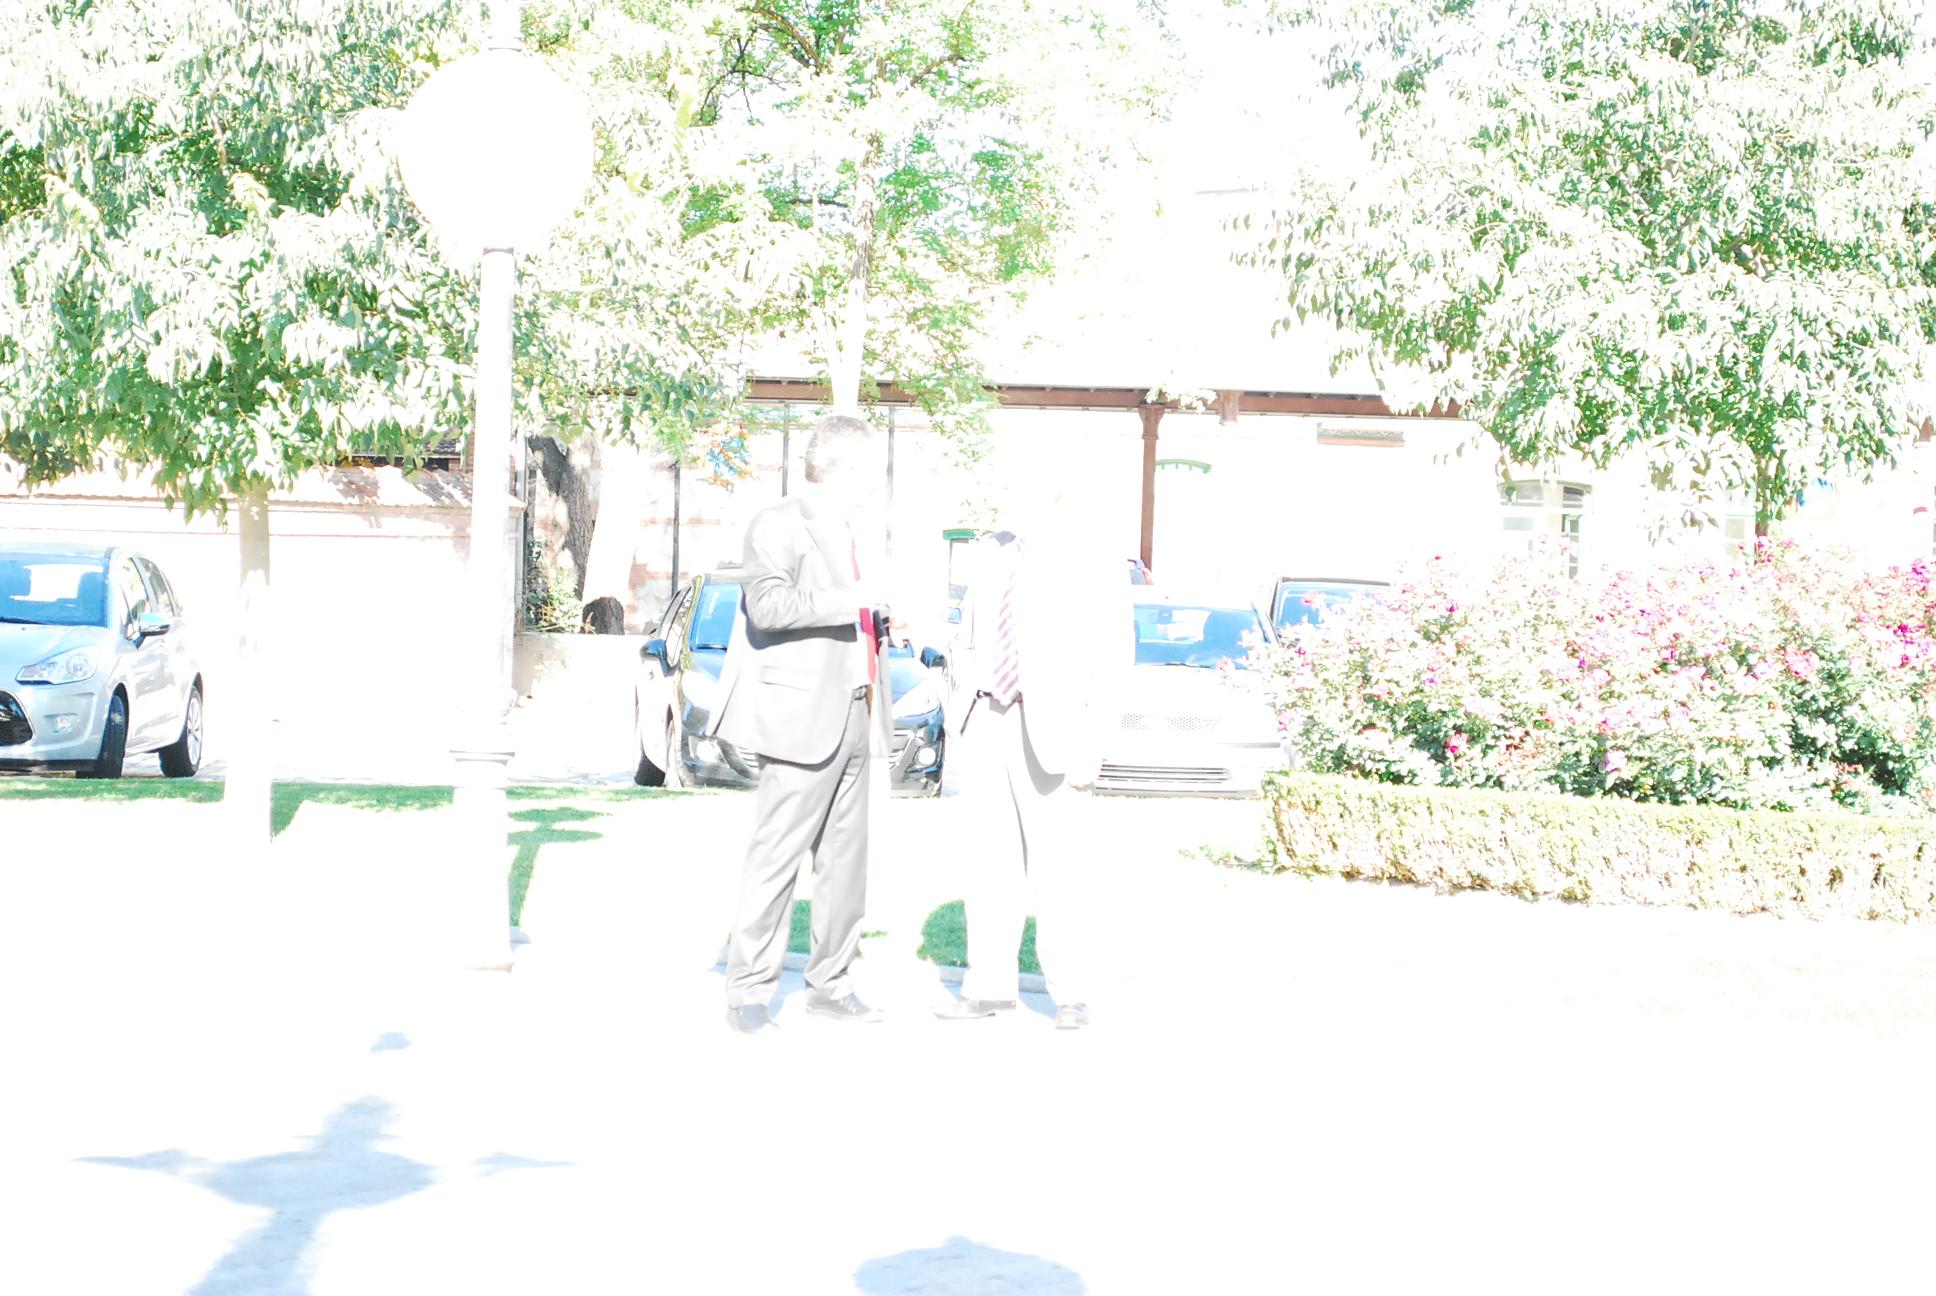 img/Original environment pictures/DSC_8065.JPG